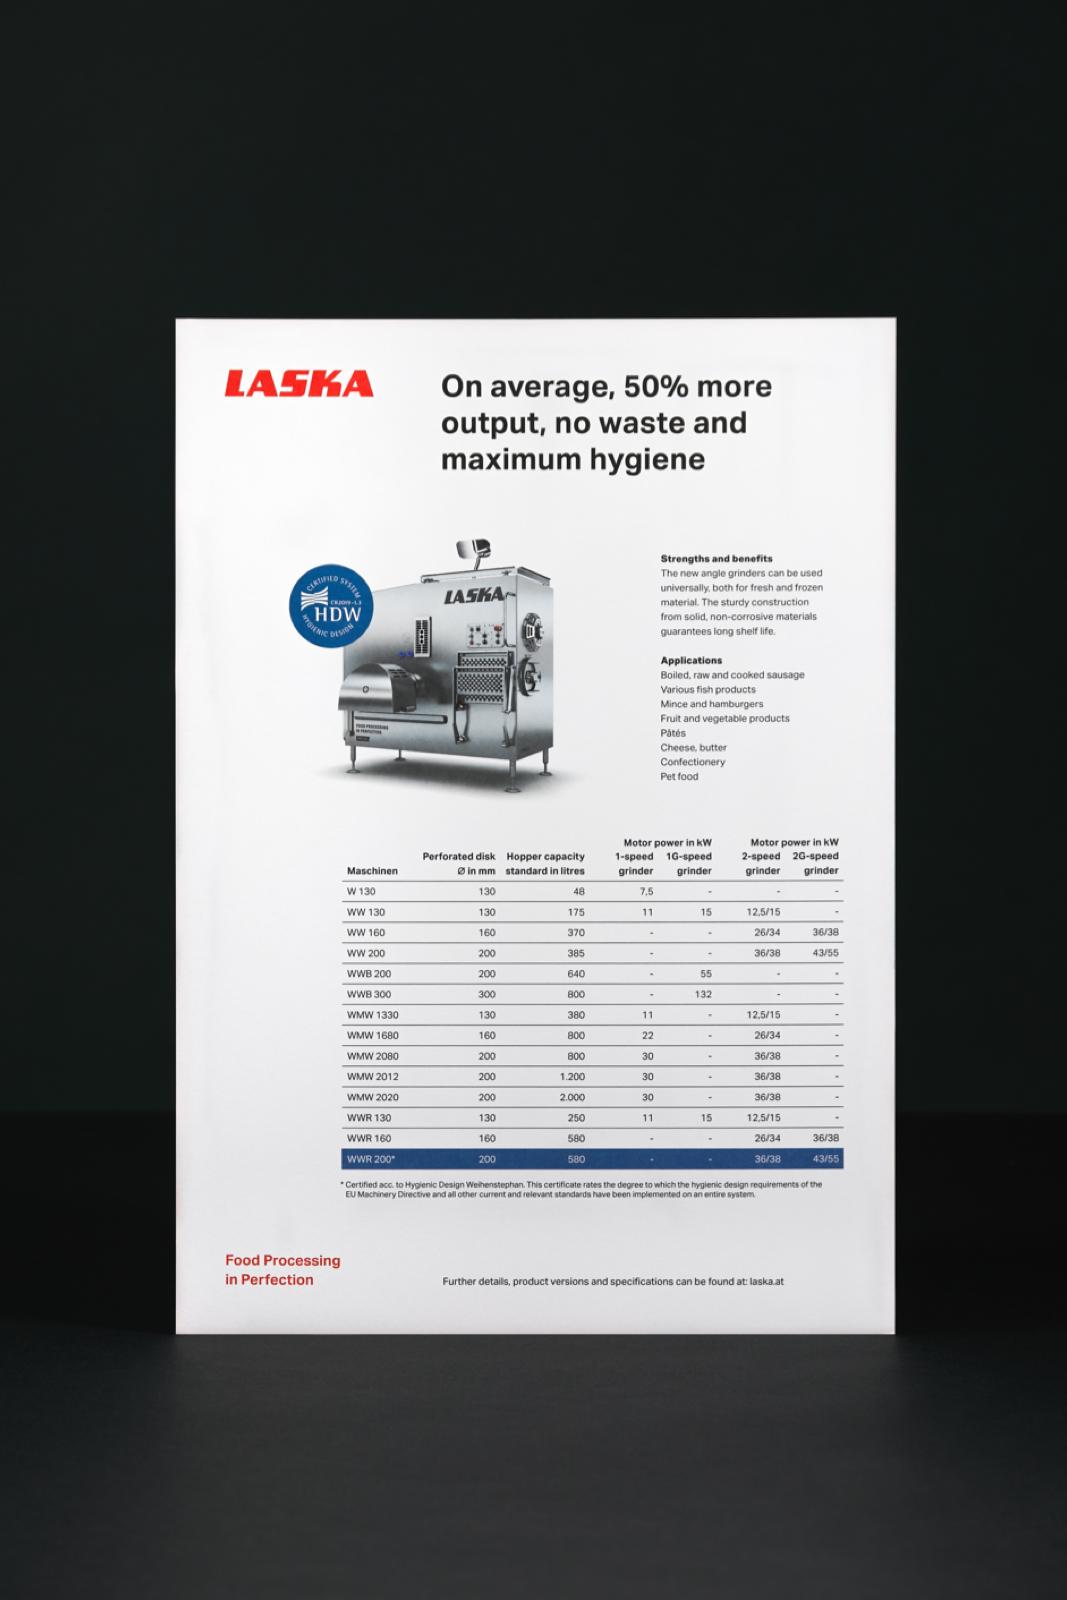 Ref laska branding 007c L product sheet